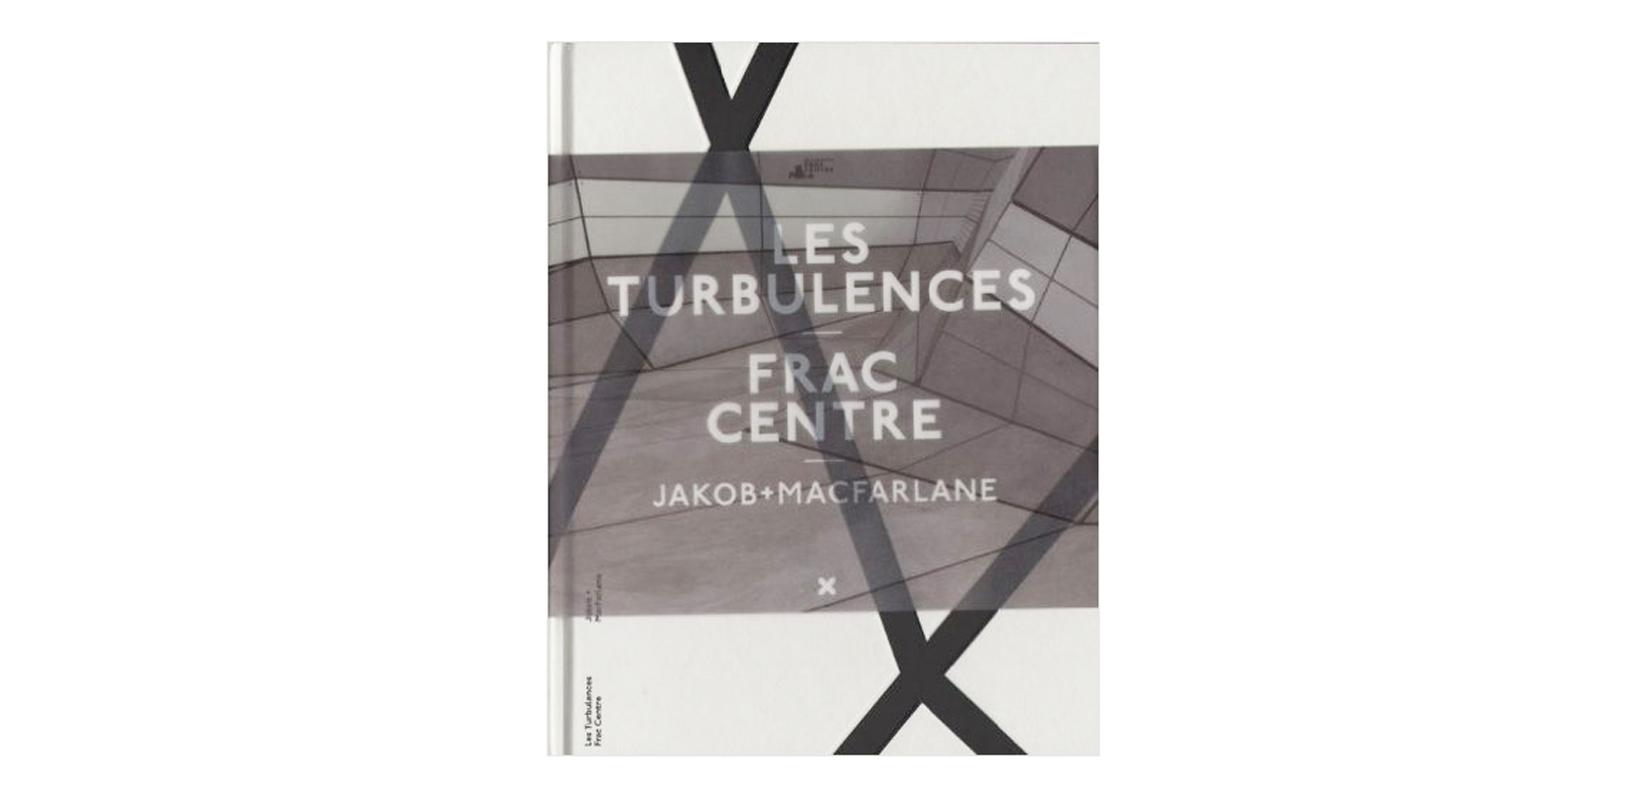 Jakob+MacFarlane_Frac Centre_HYX-cadre.jpg